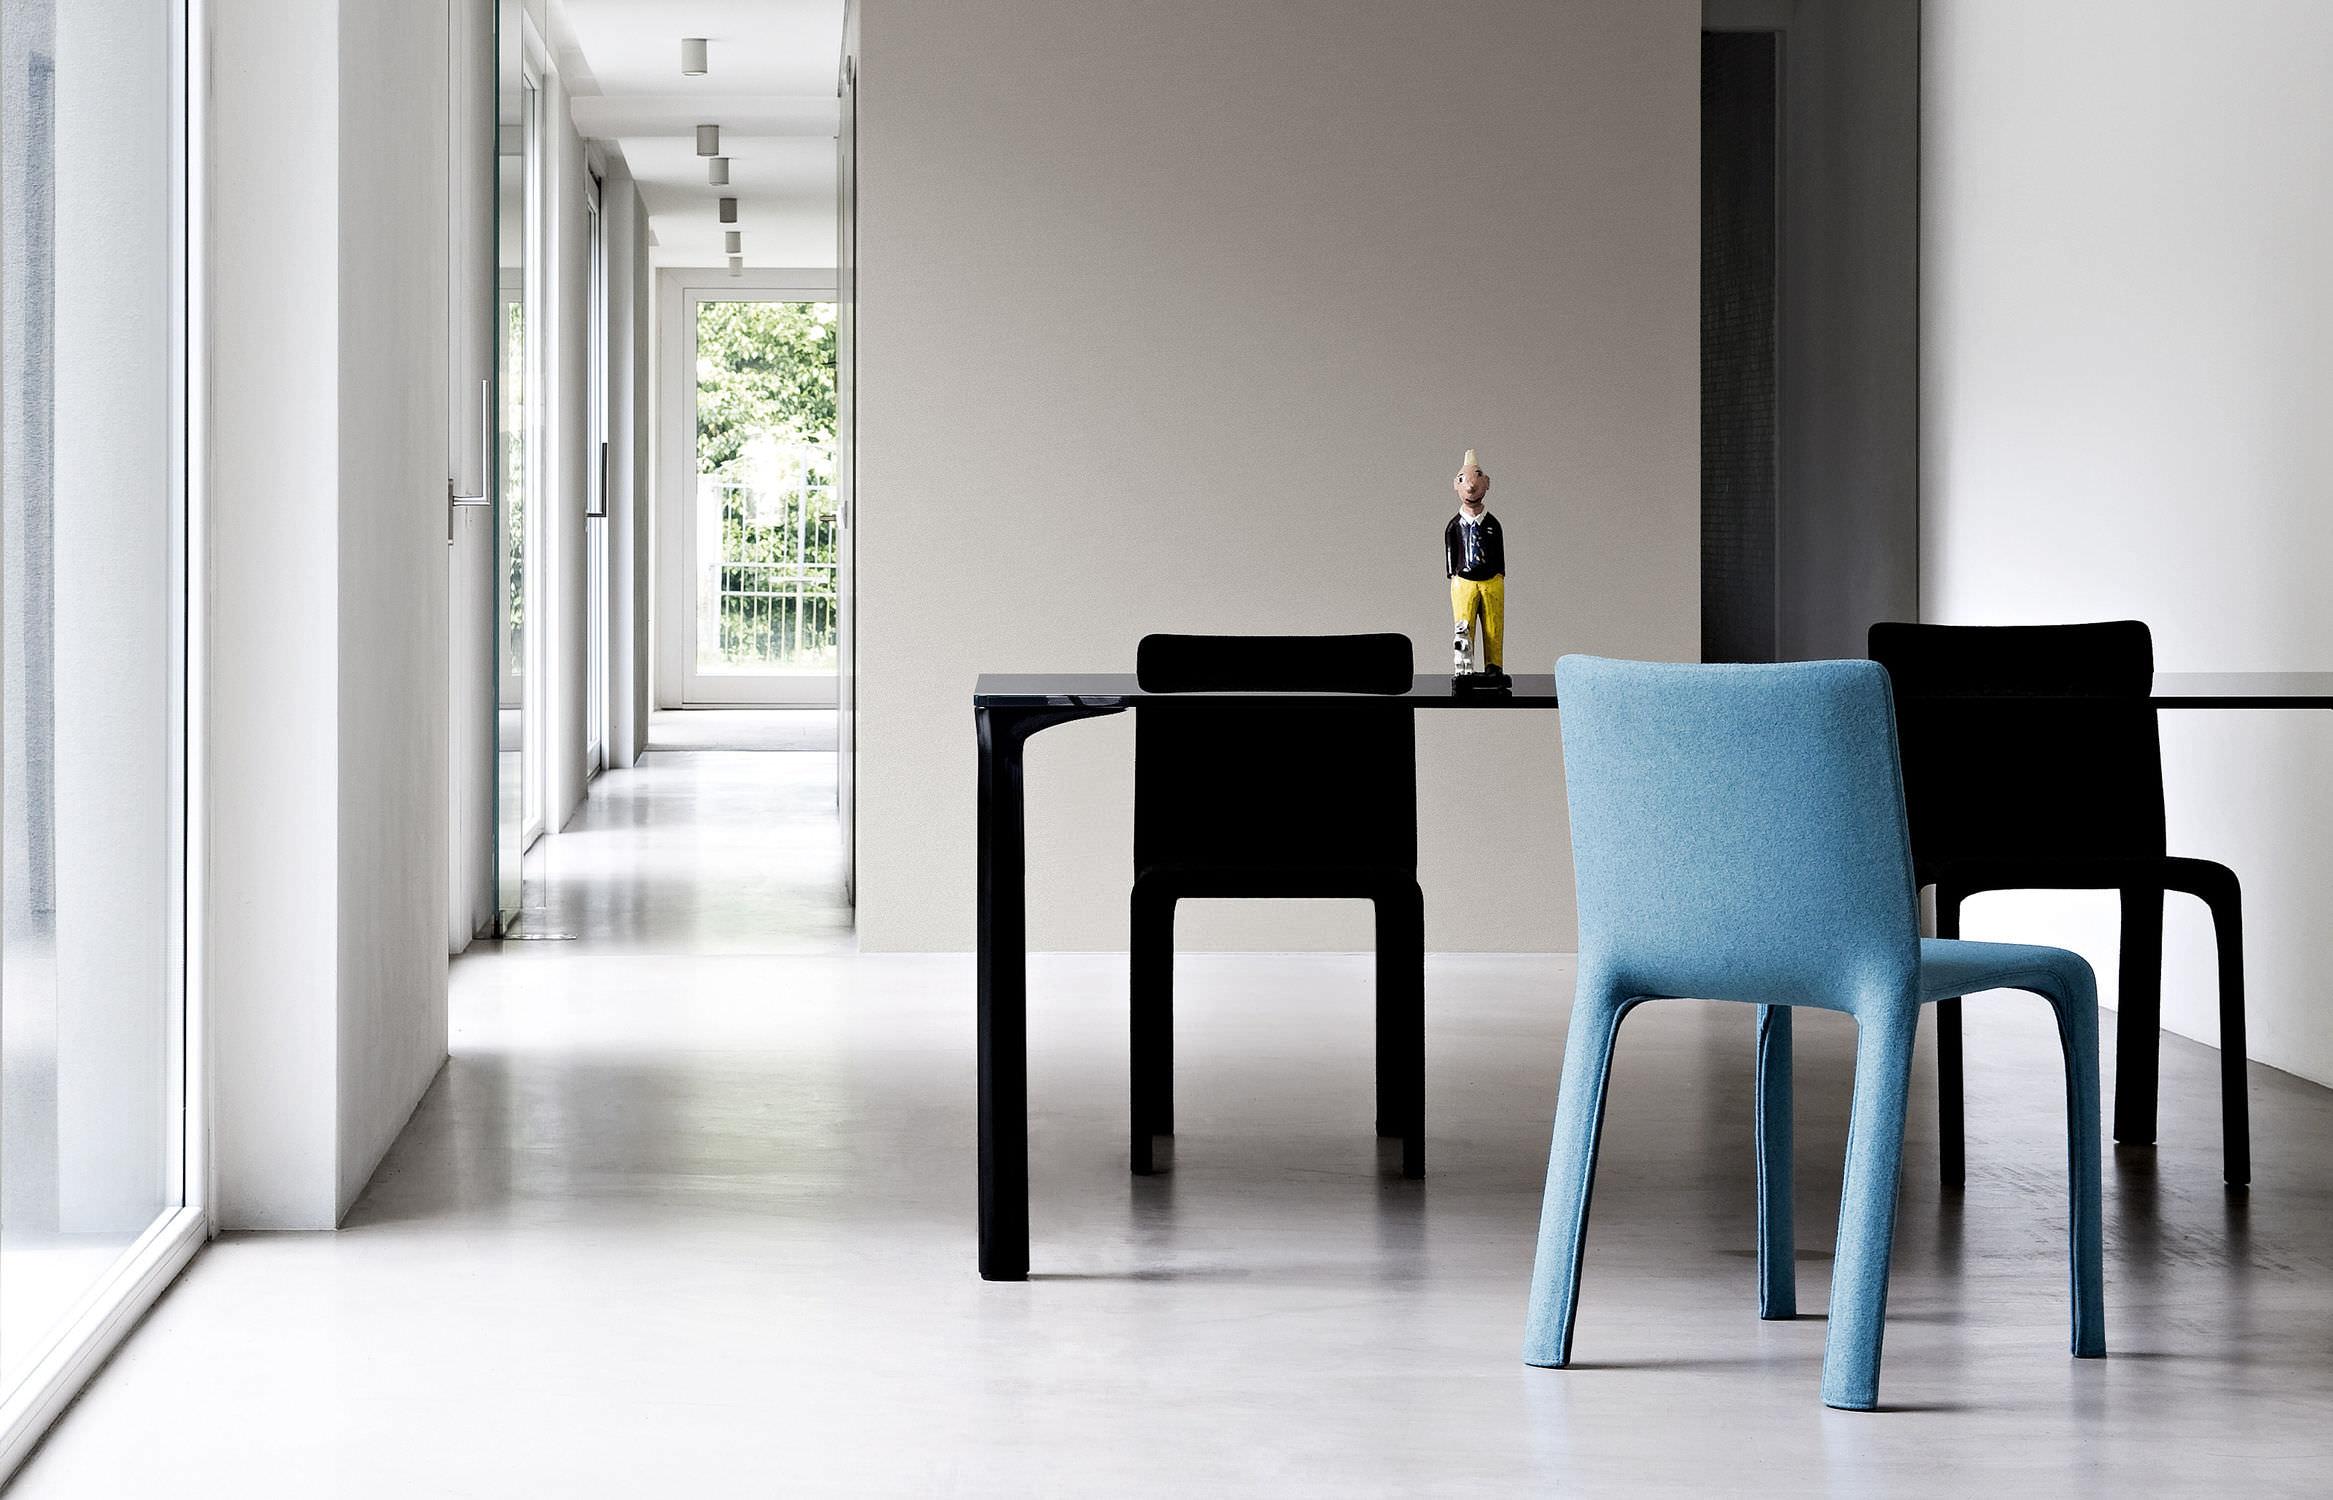 Sedia Imbottita Design : Sedia moderna imbottita con braccioli in tessuto joko by